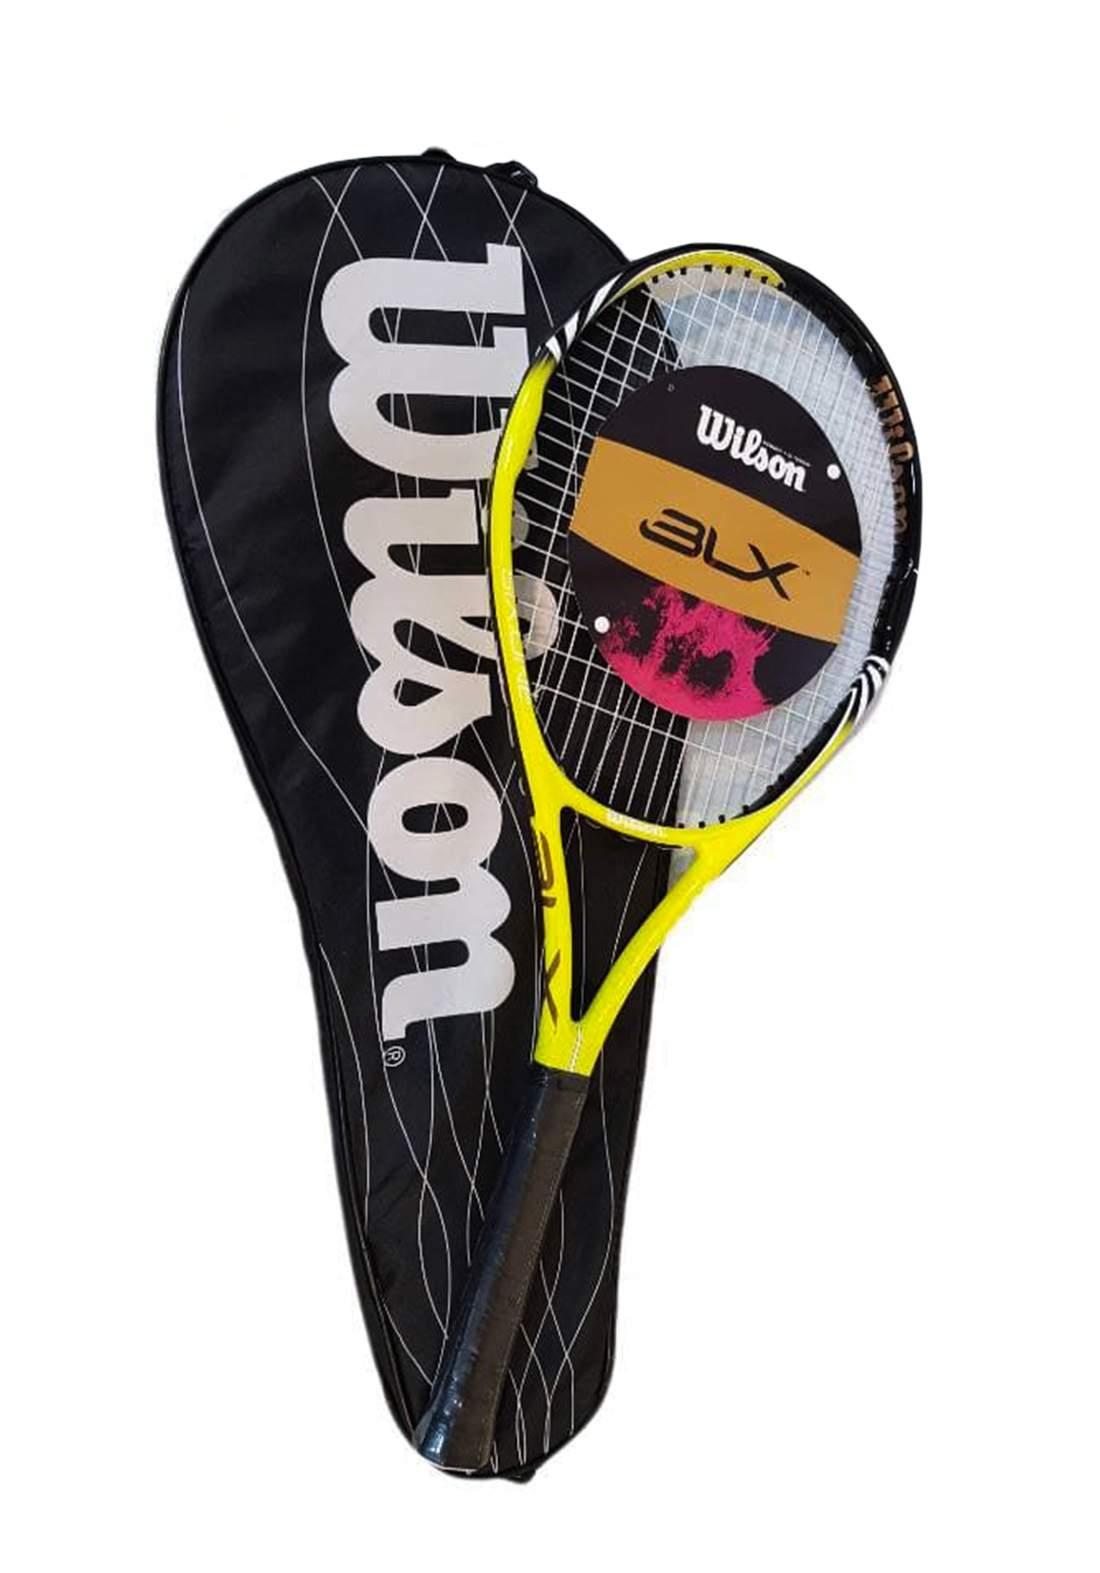 Wilson Tennis Racket مضرب تنس مفرد